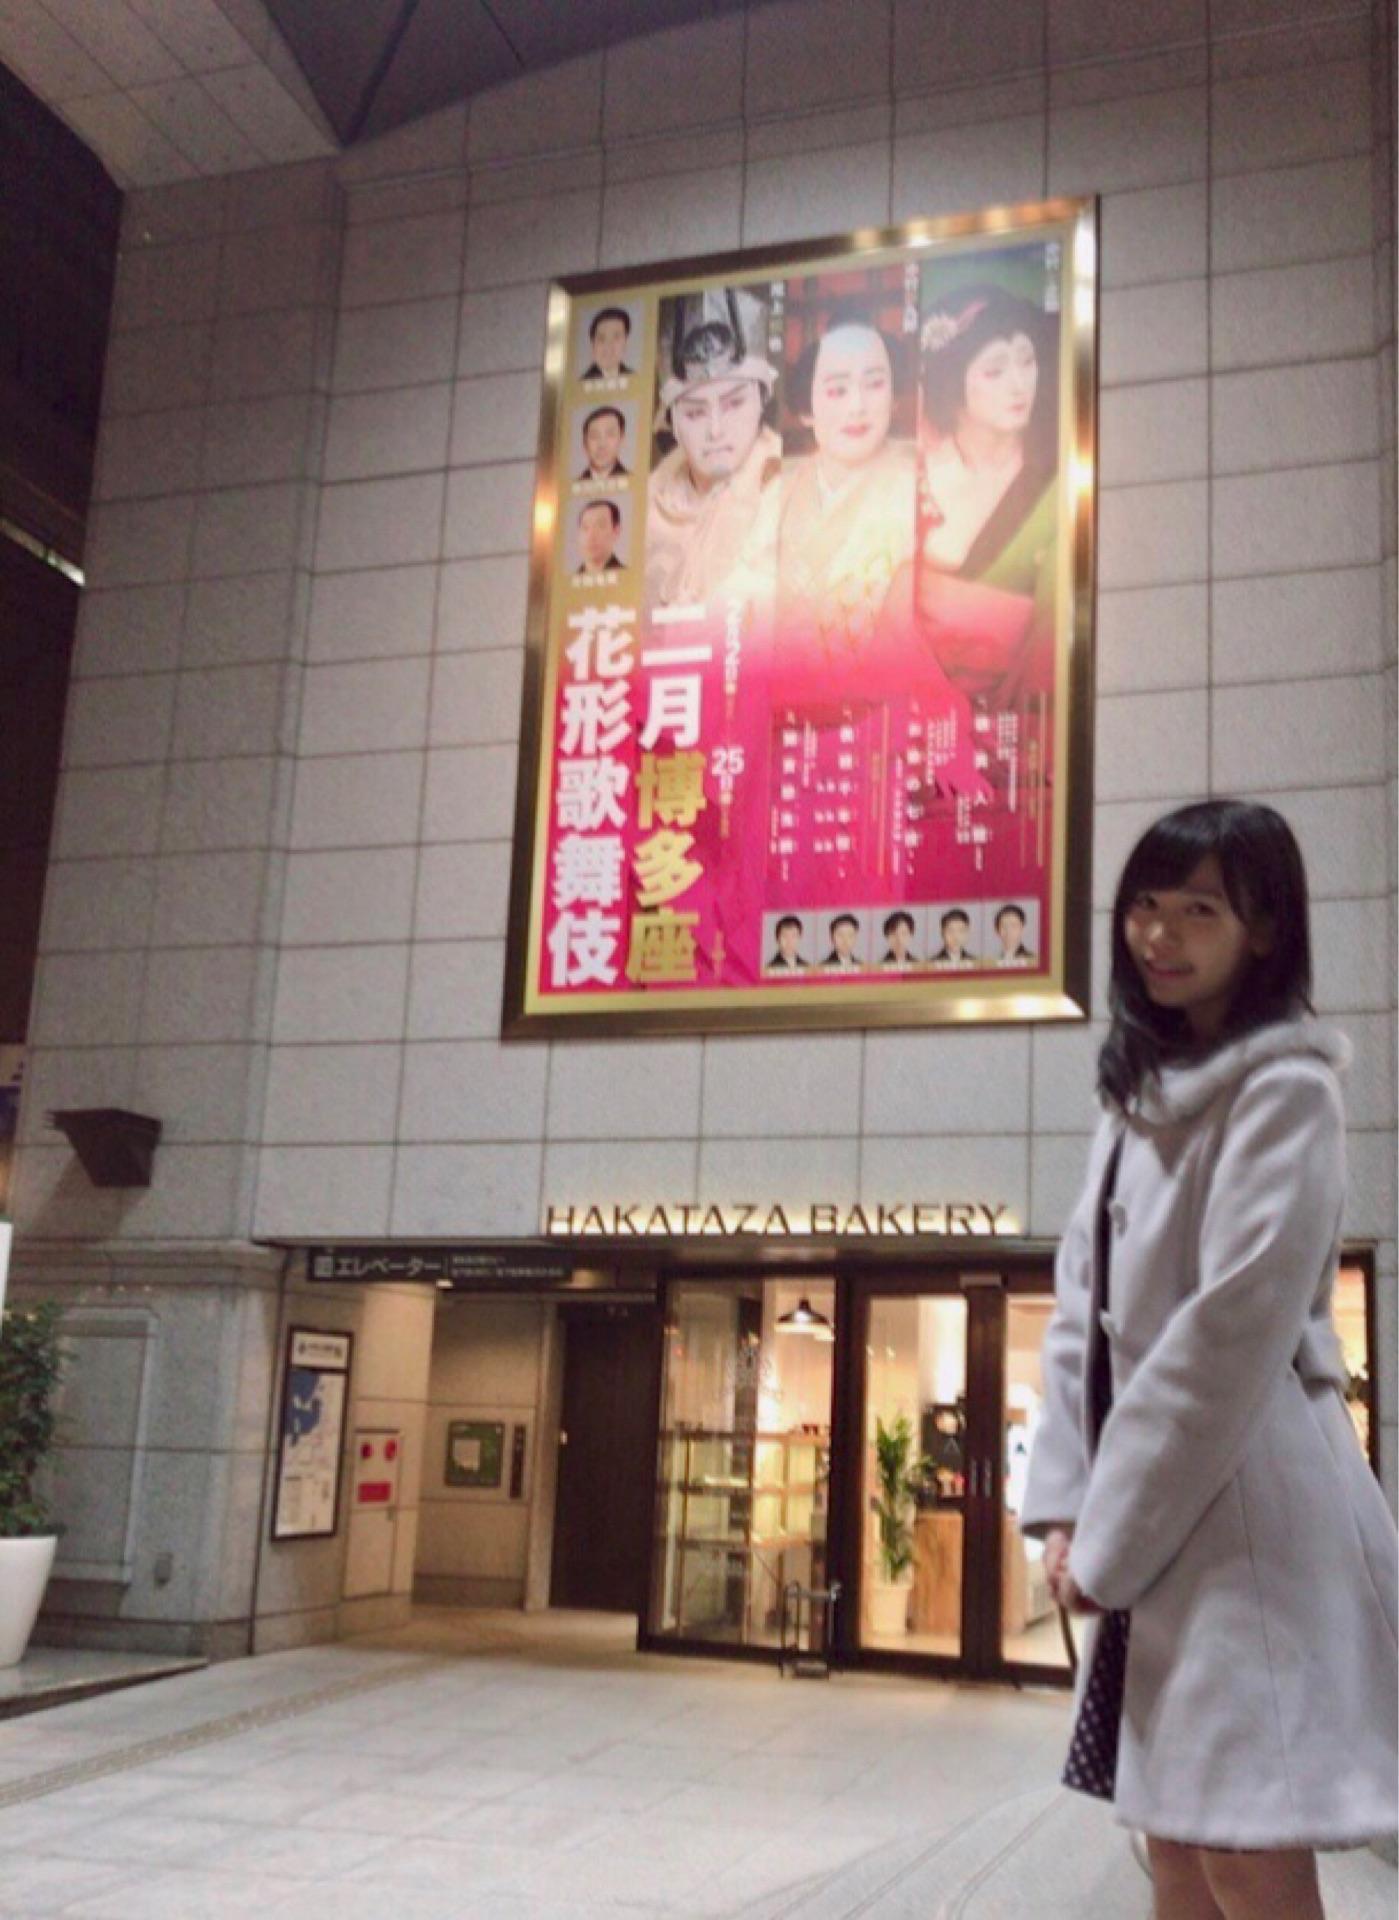 【HKT48】運上弘菜ちゃん応援スレ☆41【なっぴ/チームKIV】YouTube動画>19本 ->画像>264枚